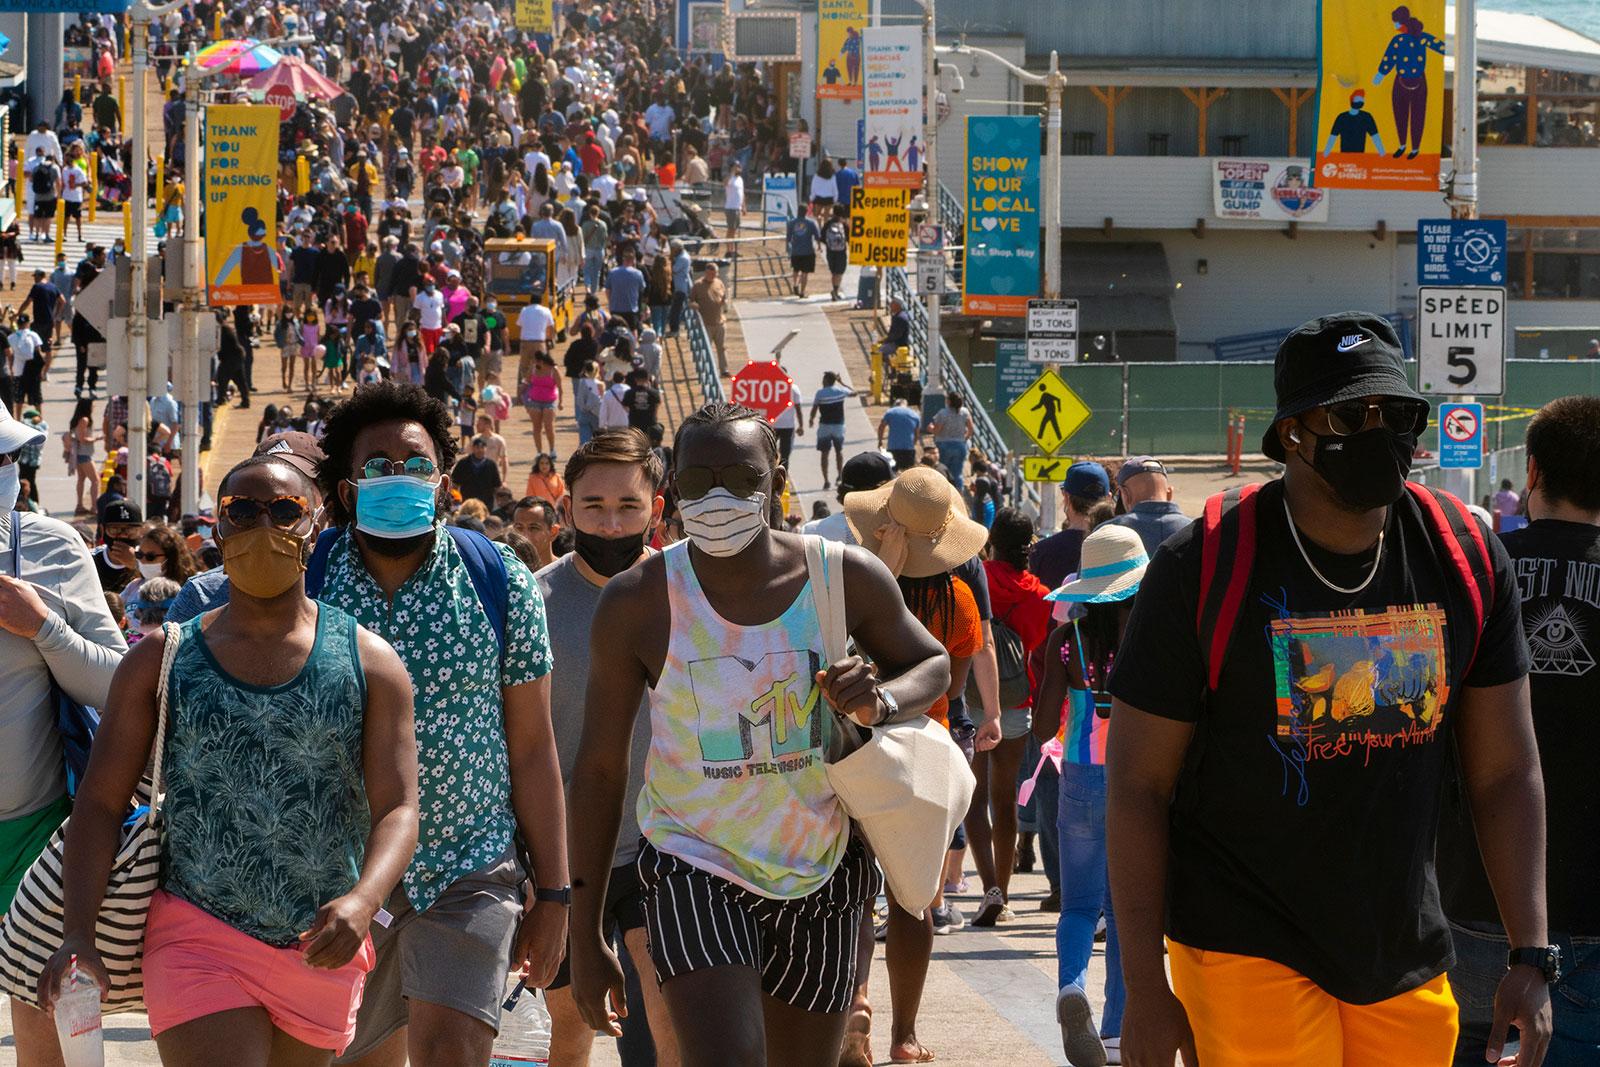 People walk along the Santa Monica Pier in California on Saturday, May 29.